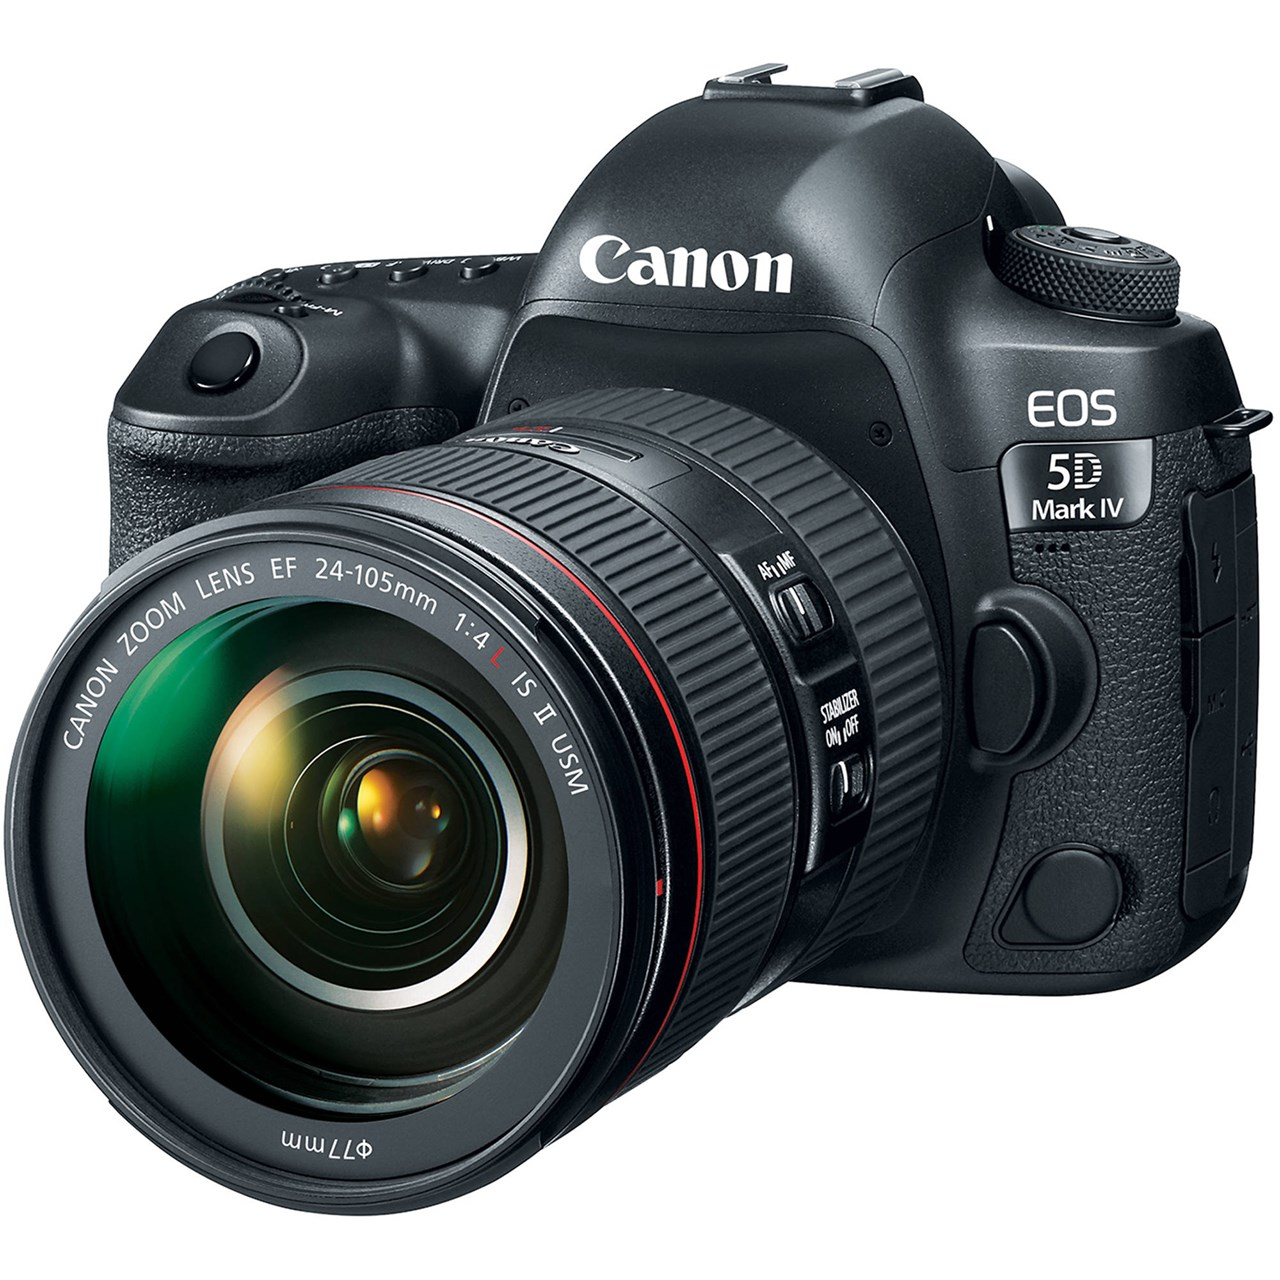 دوربین دیجیتال کانن مدل EOS 5D Mark IV به همراه لنز ۲۴-۱۰۵ میلی متر F4 L IS II